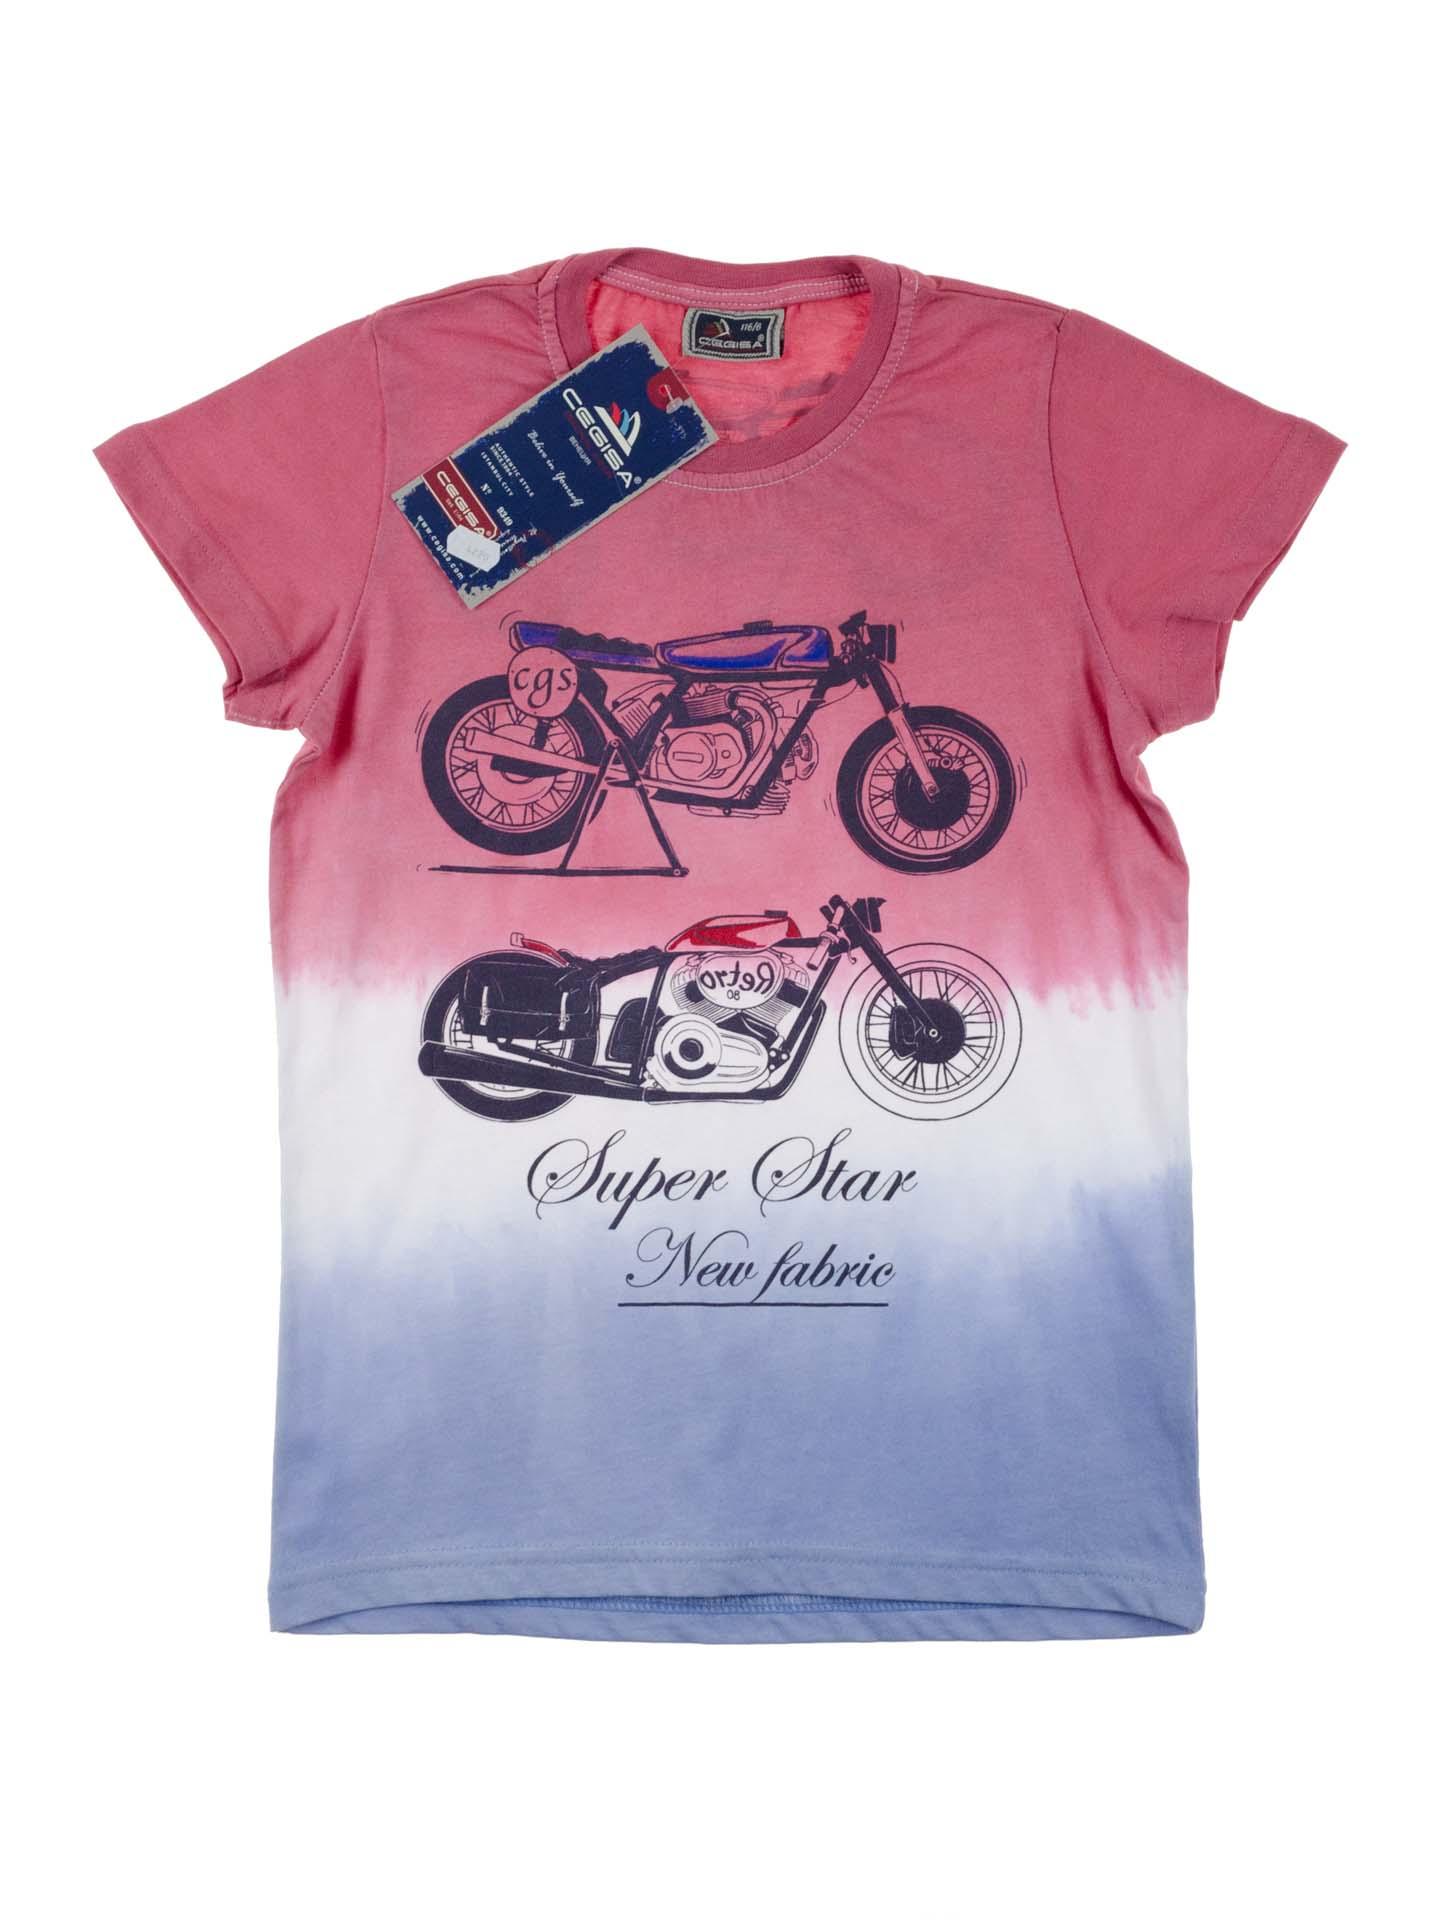 Купити Яскрава літня футболка  6918e8d3b8c6e